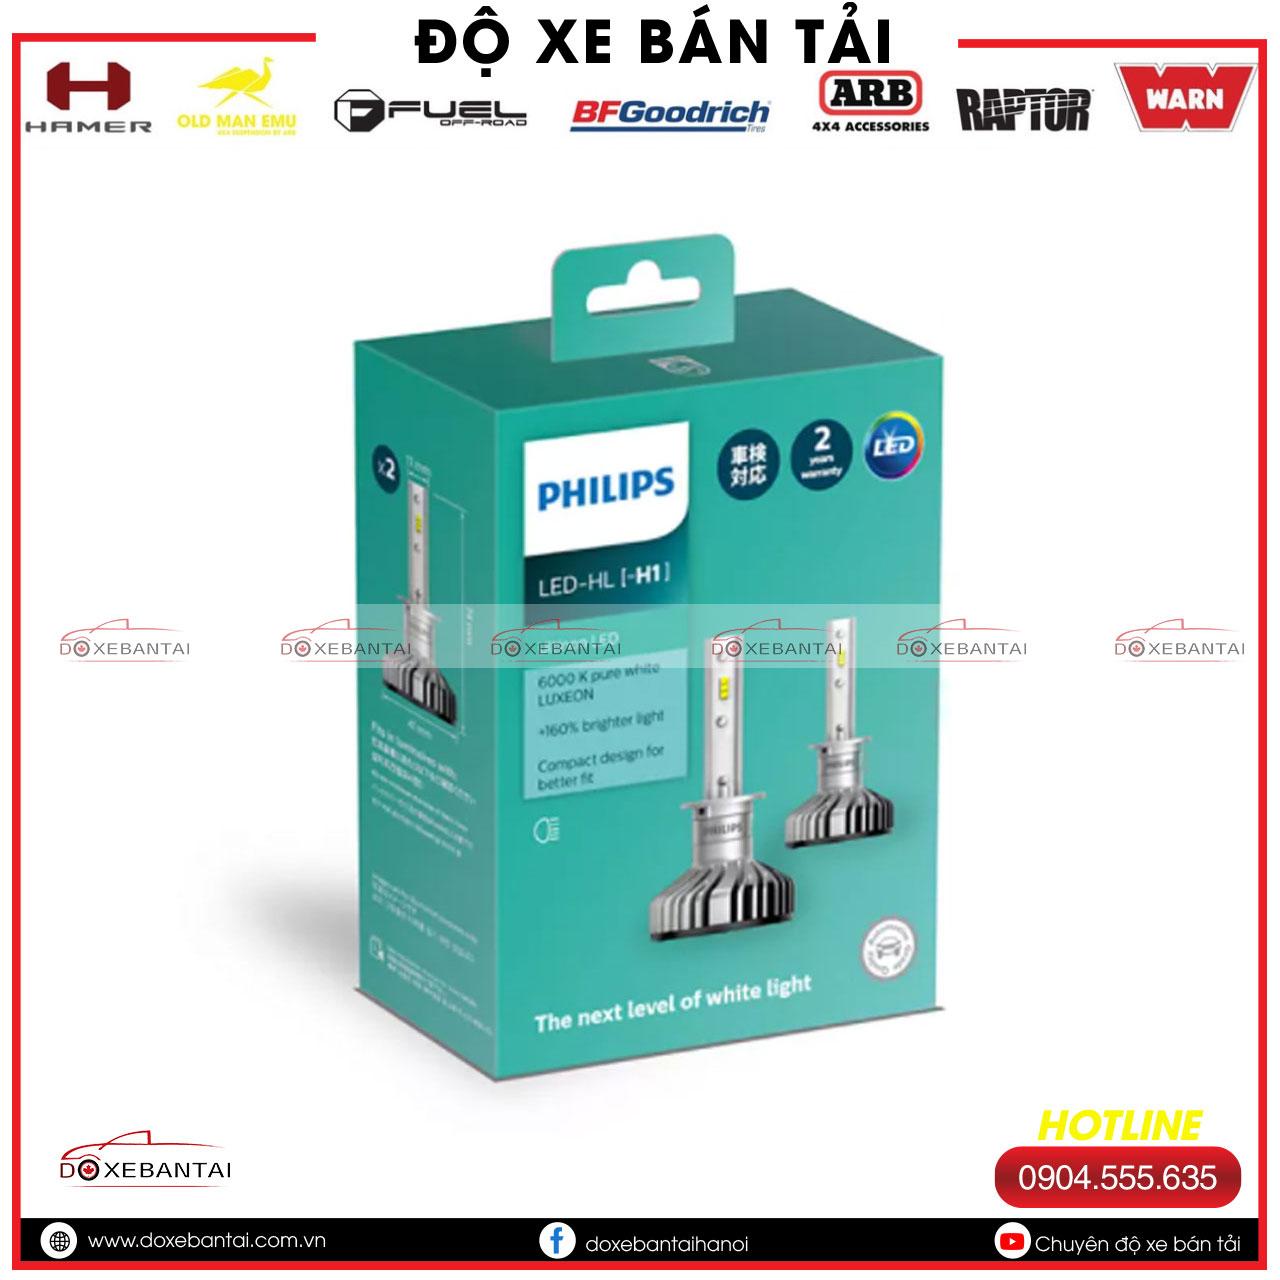 Bong-den-H1-Philips-Ultinon-LED-cuong-do-cao-2.jpg